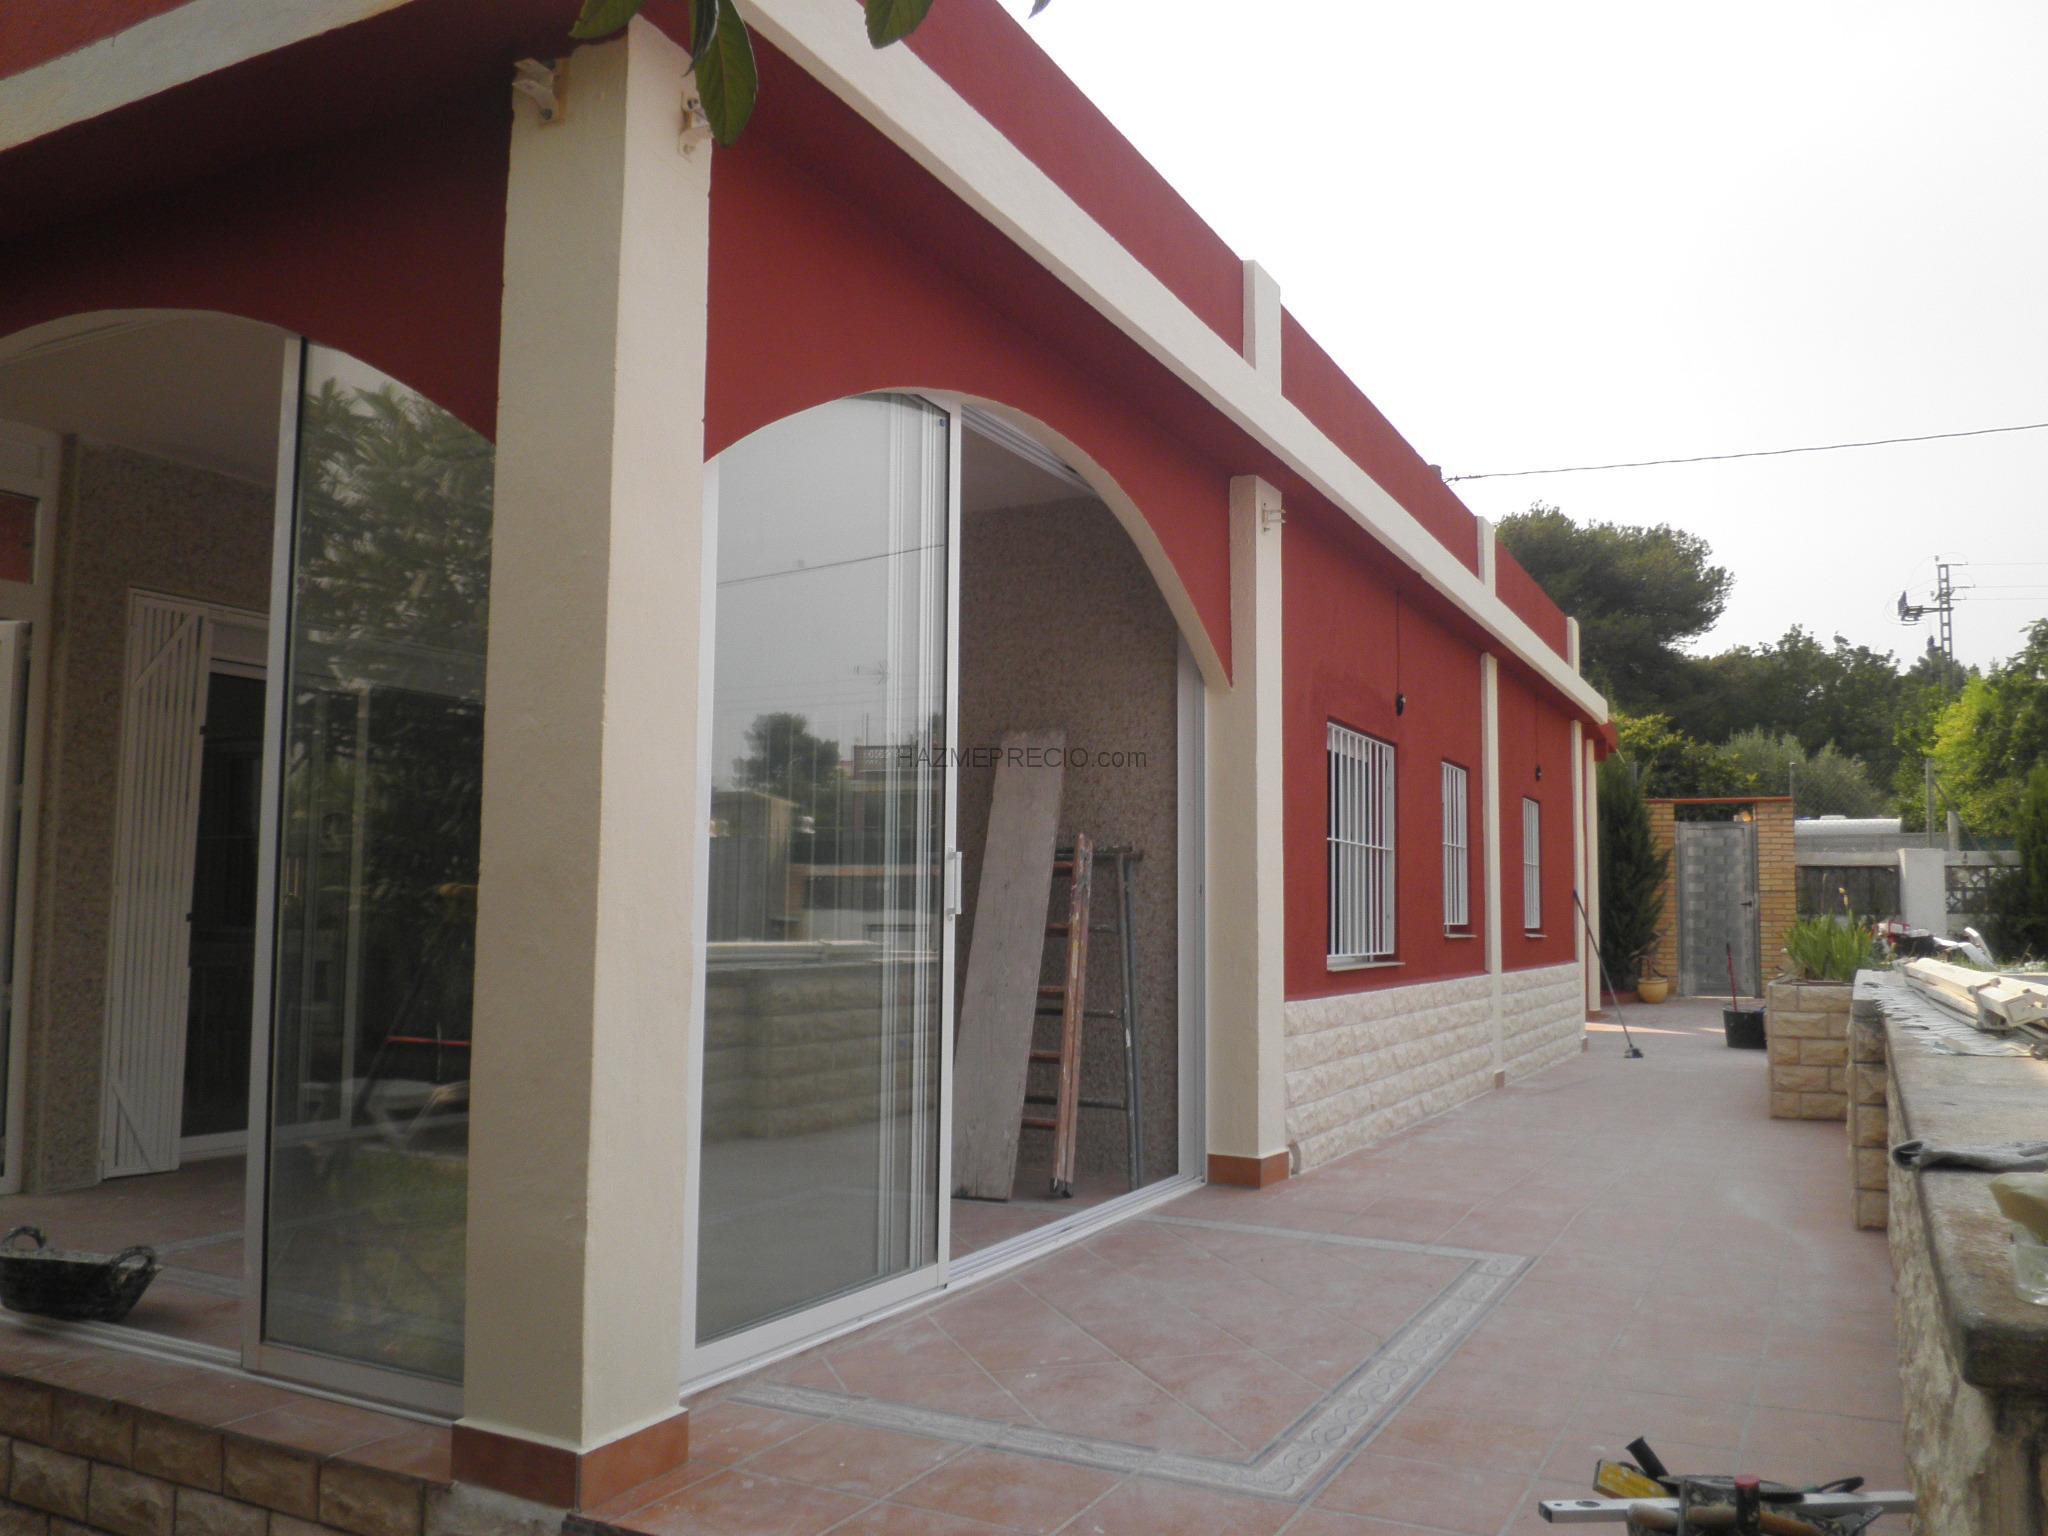 Empresas de rehabilitacion de edificios en valencia - Empresas de construccion valencia ...